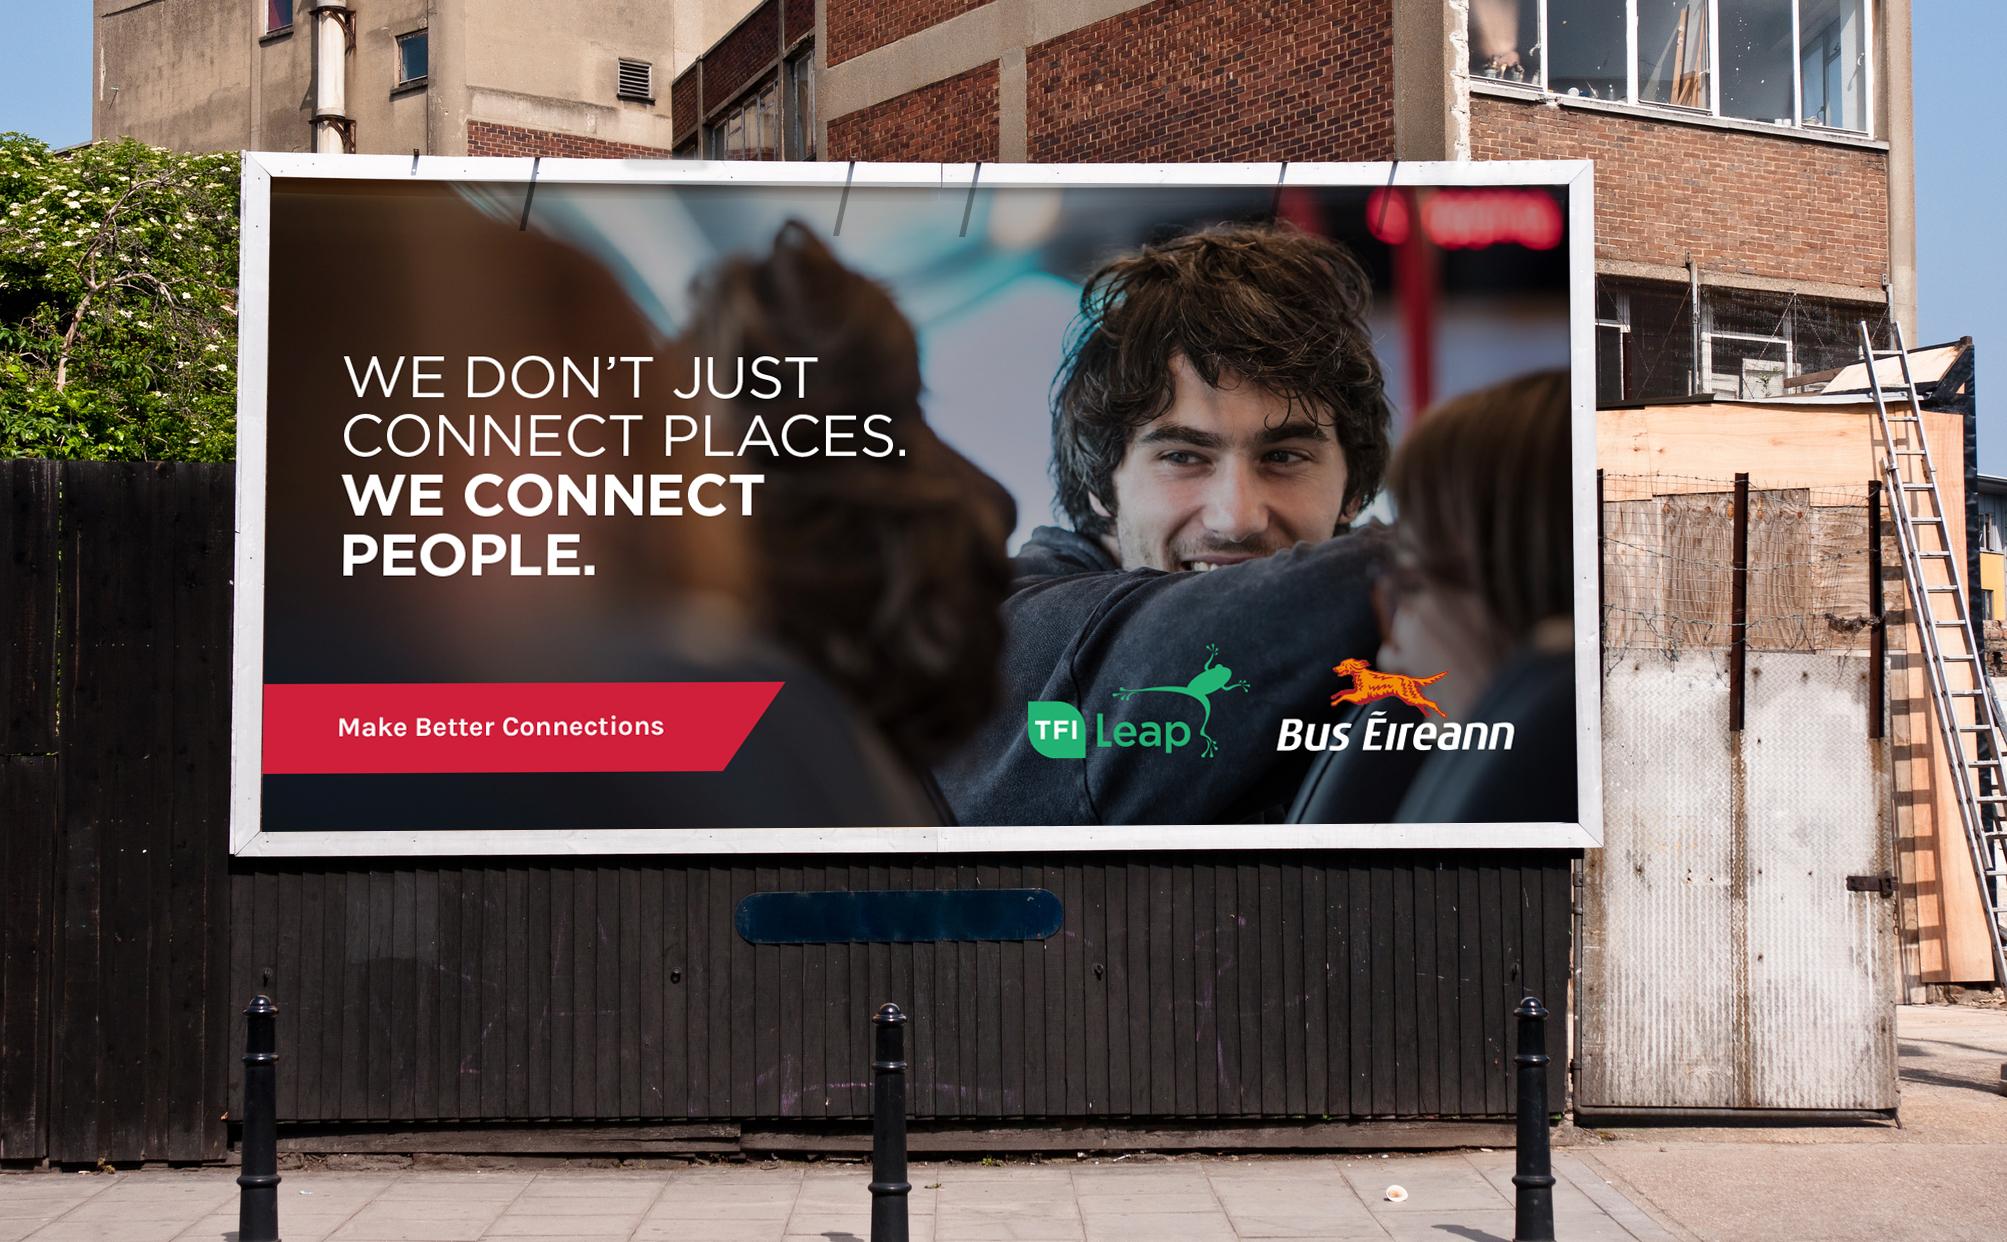 BE_billboard 1.jpg